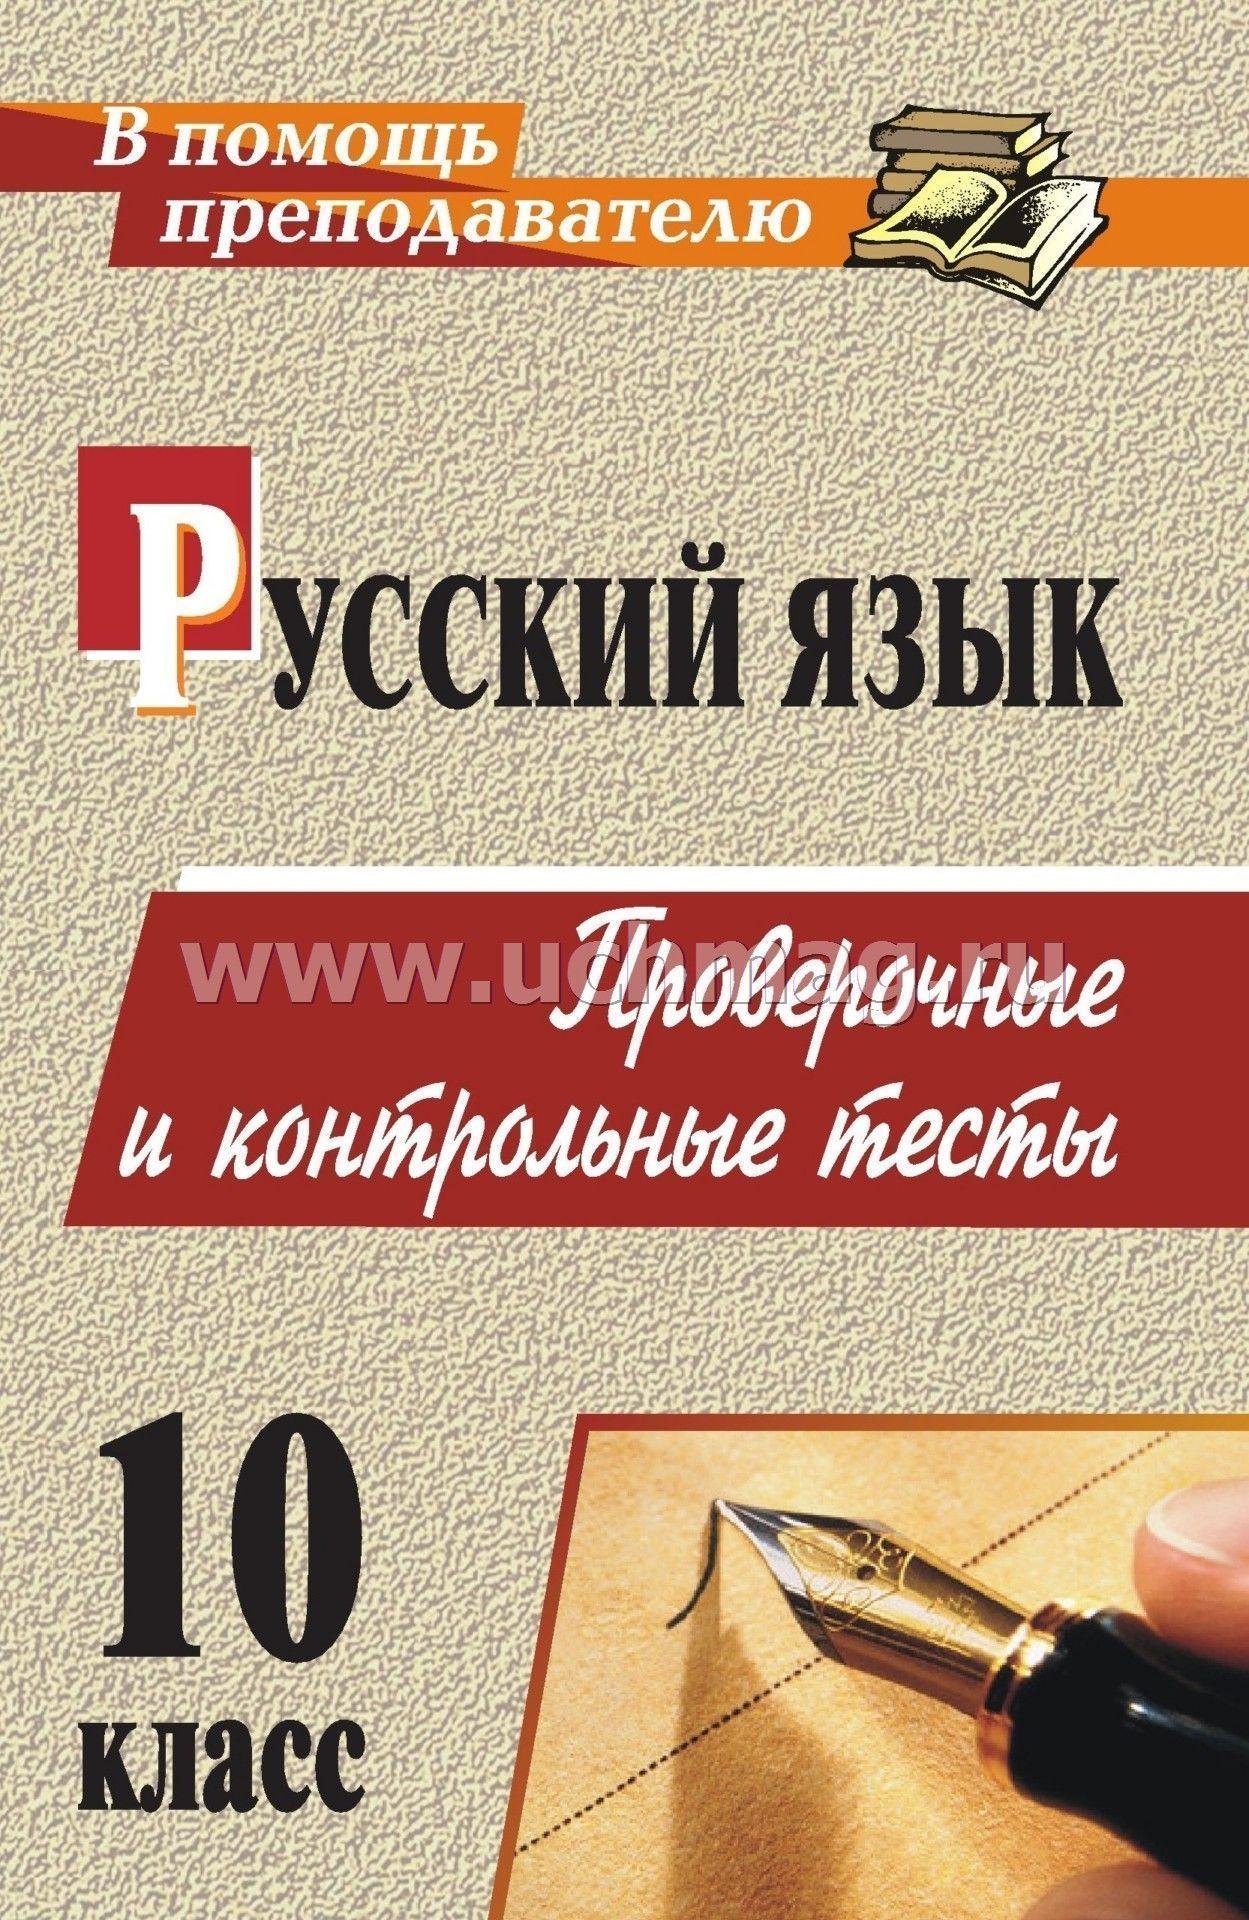 Вазанова тесты по русскому языку 2018 5-7 класс